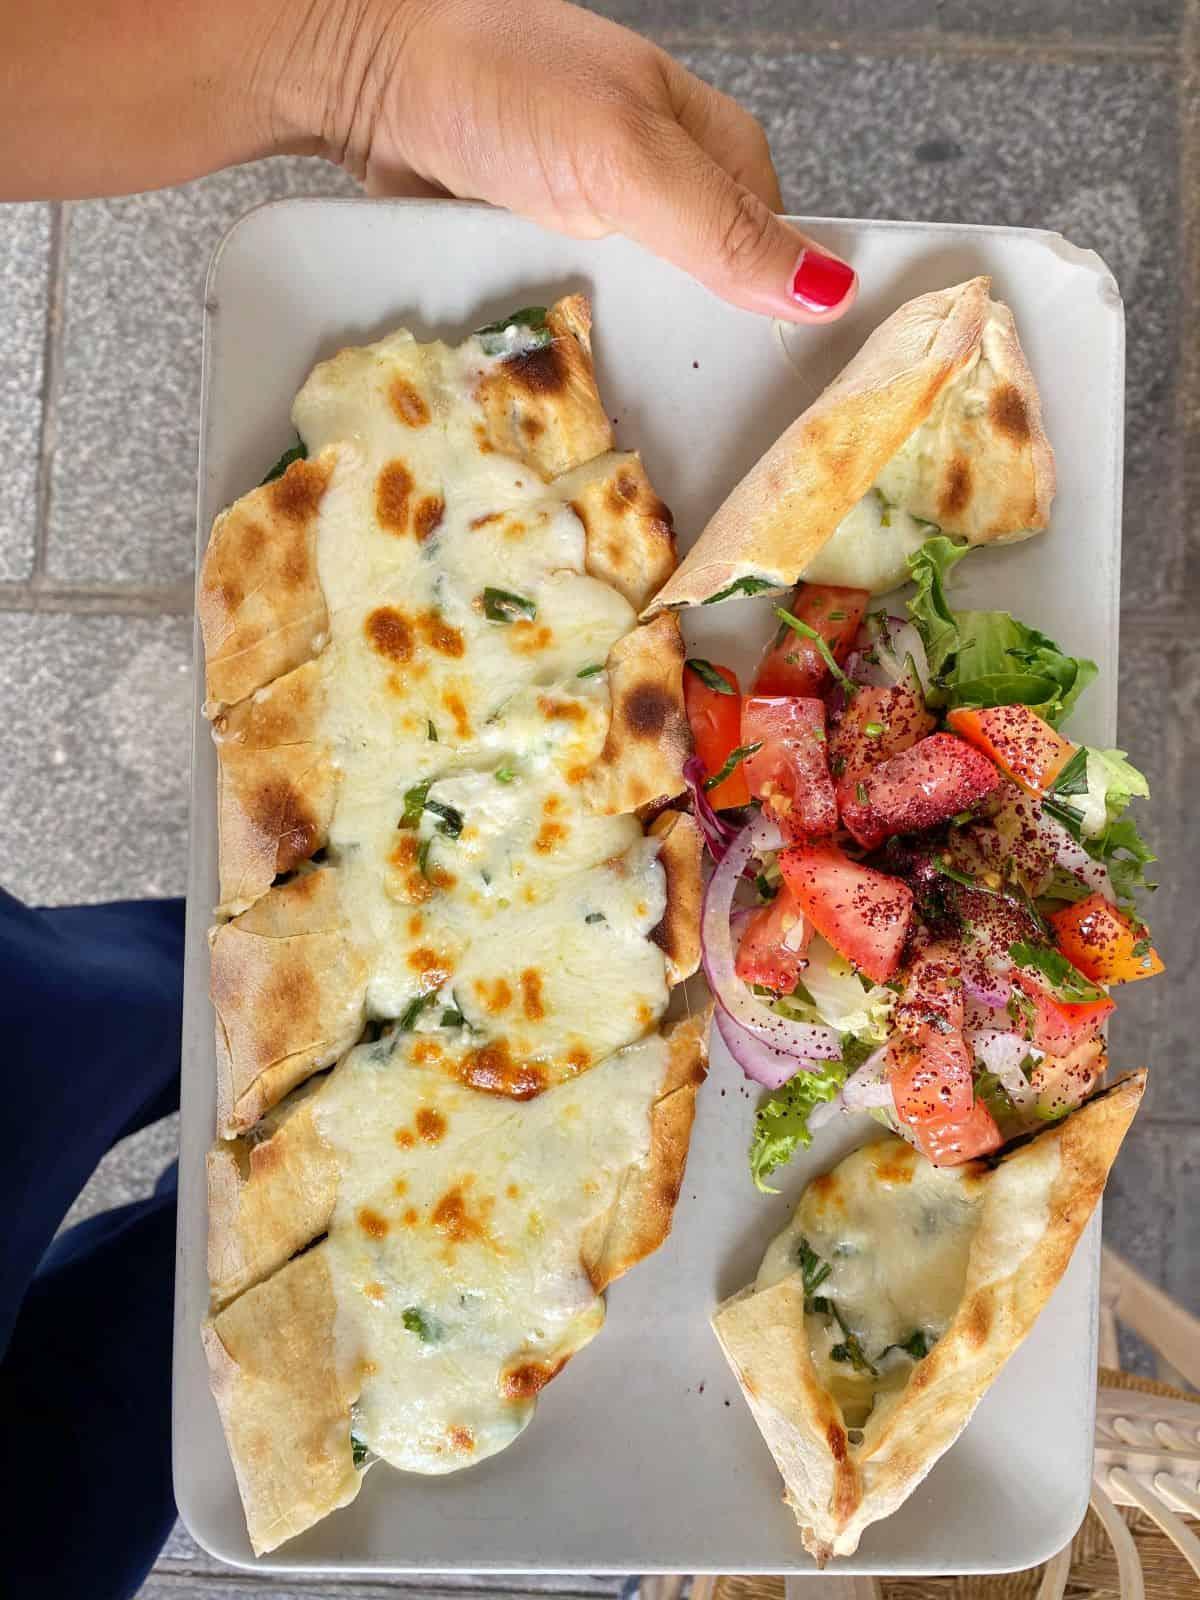 anatolia-village-restaurant-turque-paris-10eme-lahmacun